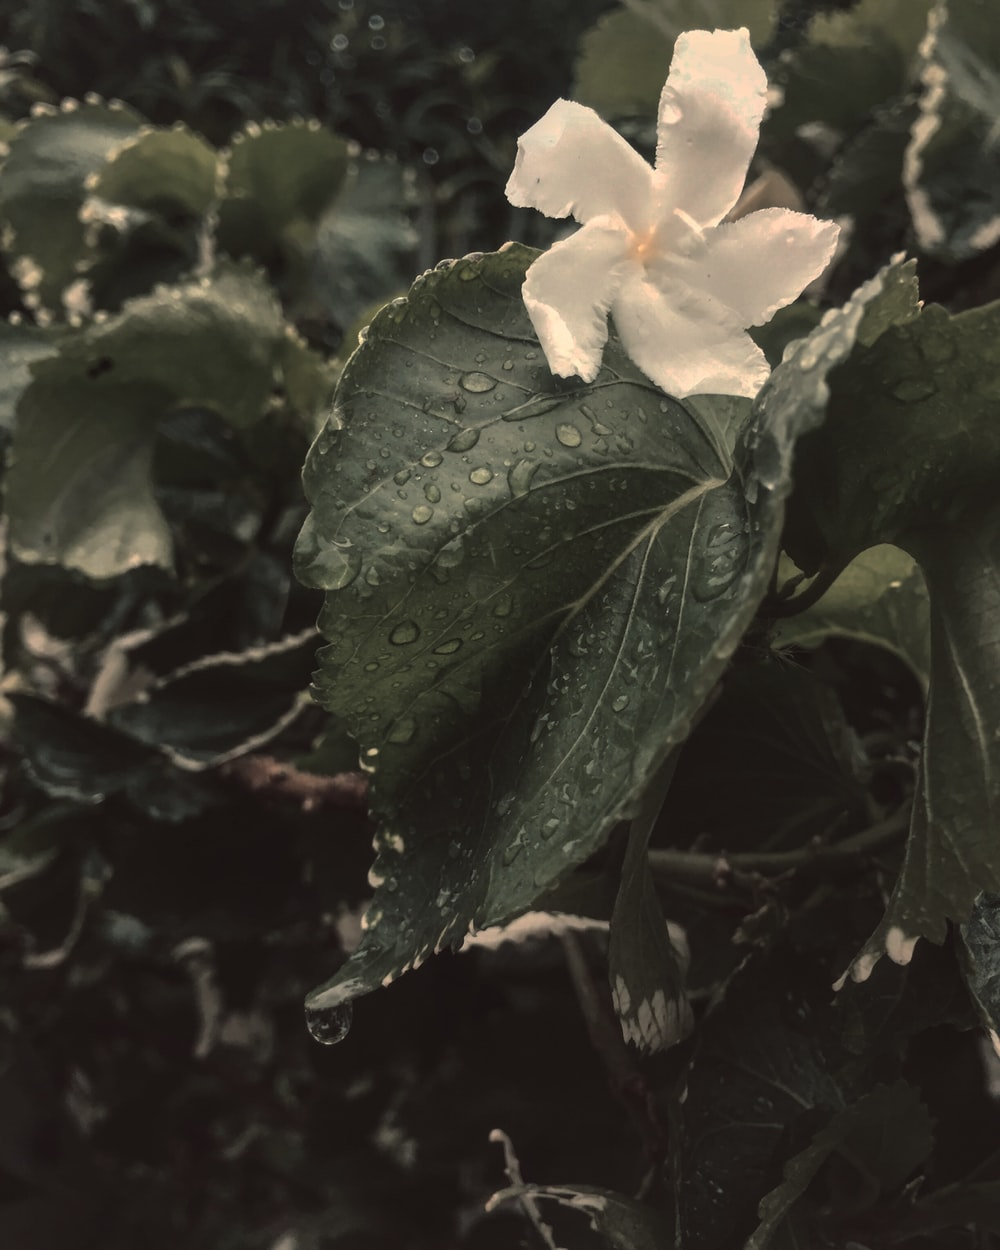 white petaled flower blooming